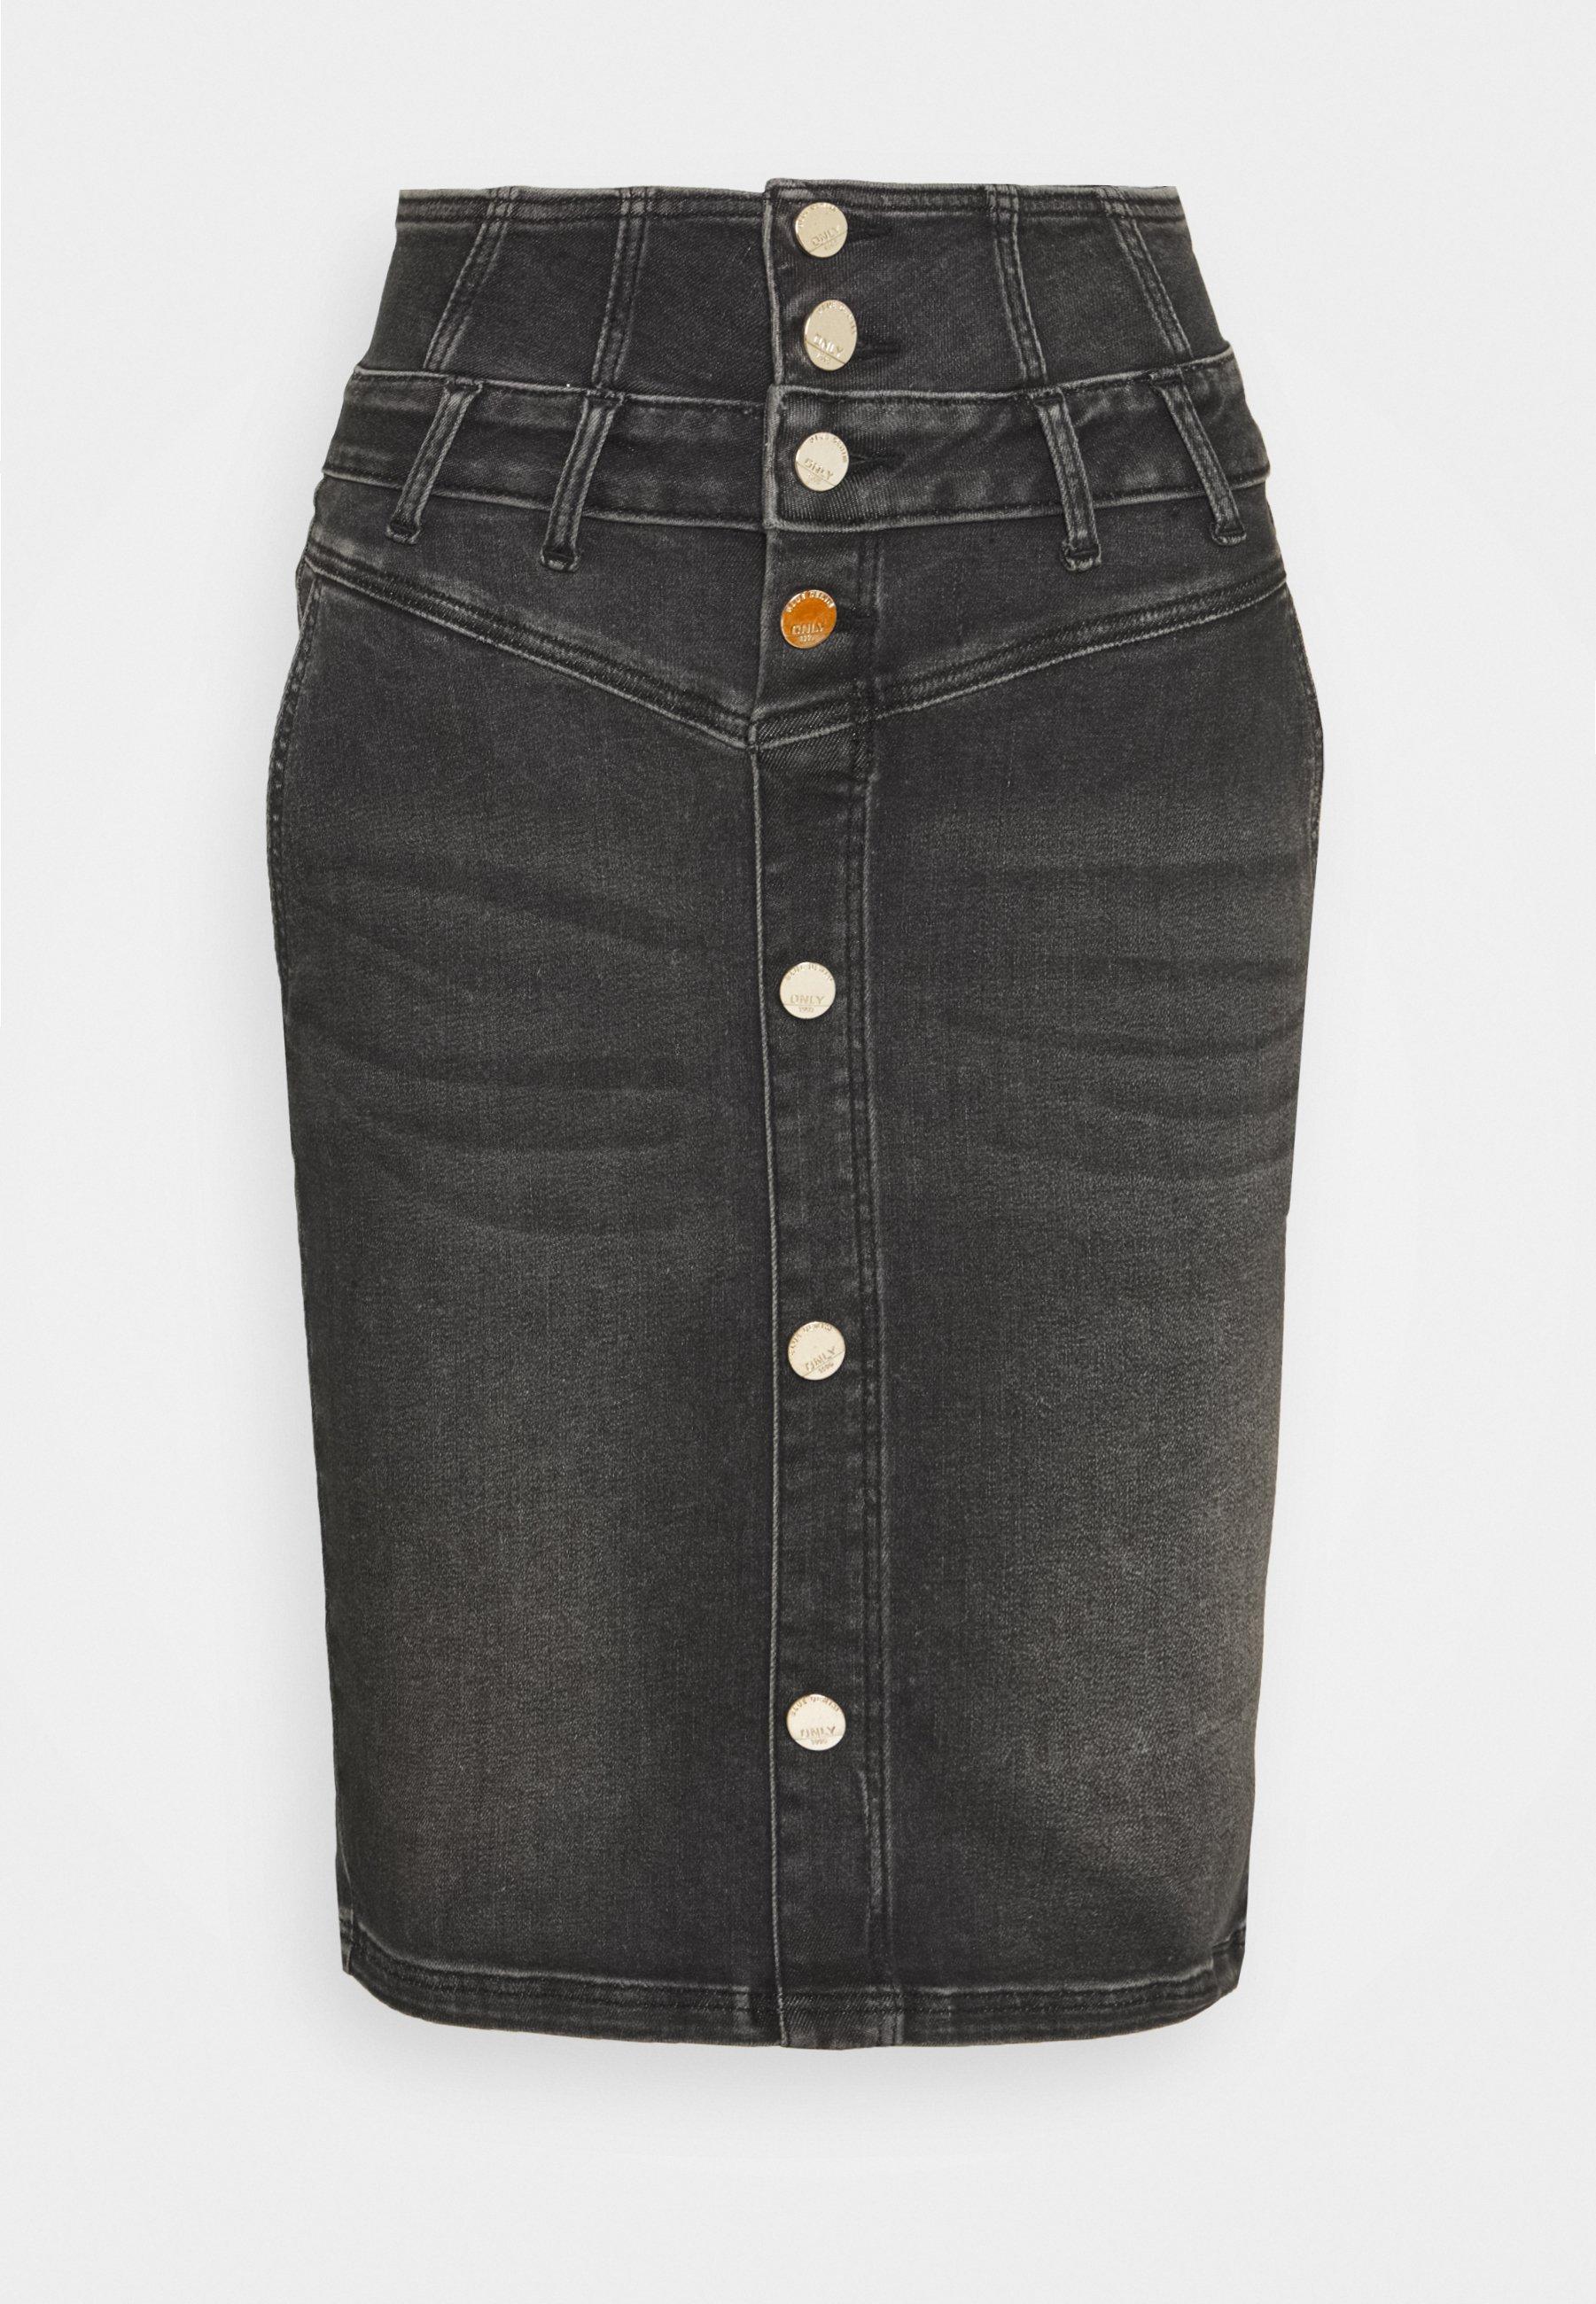 Femme ONLHUSH CORSAGE BUTTON SKIRT - Jupe en jean